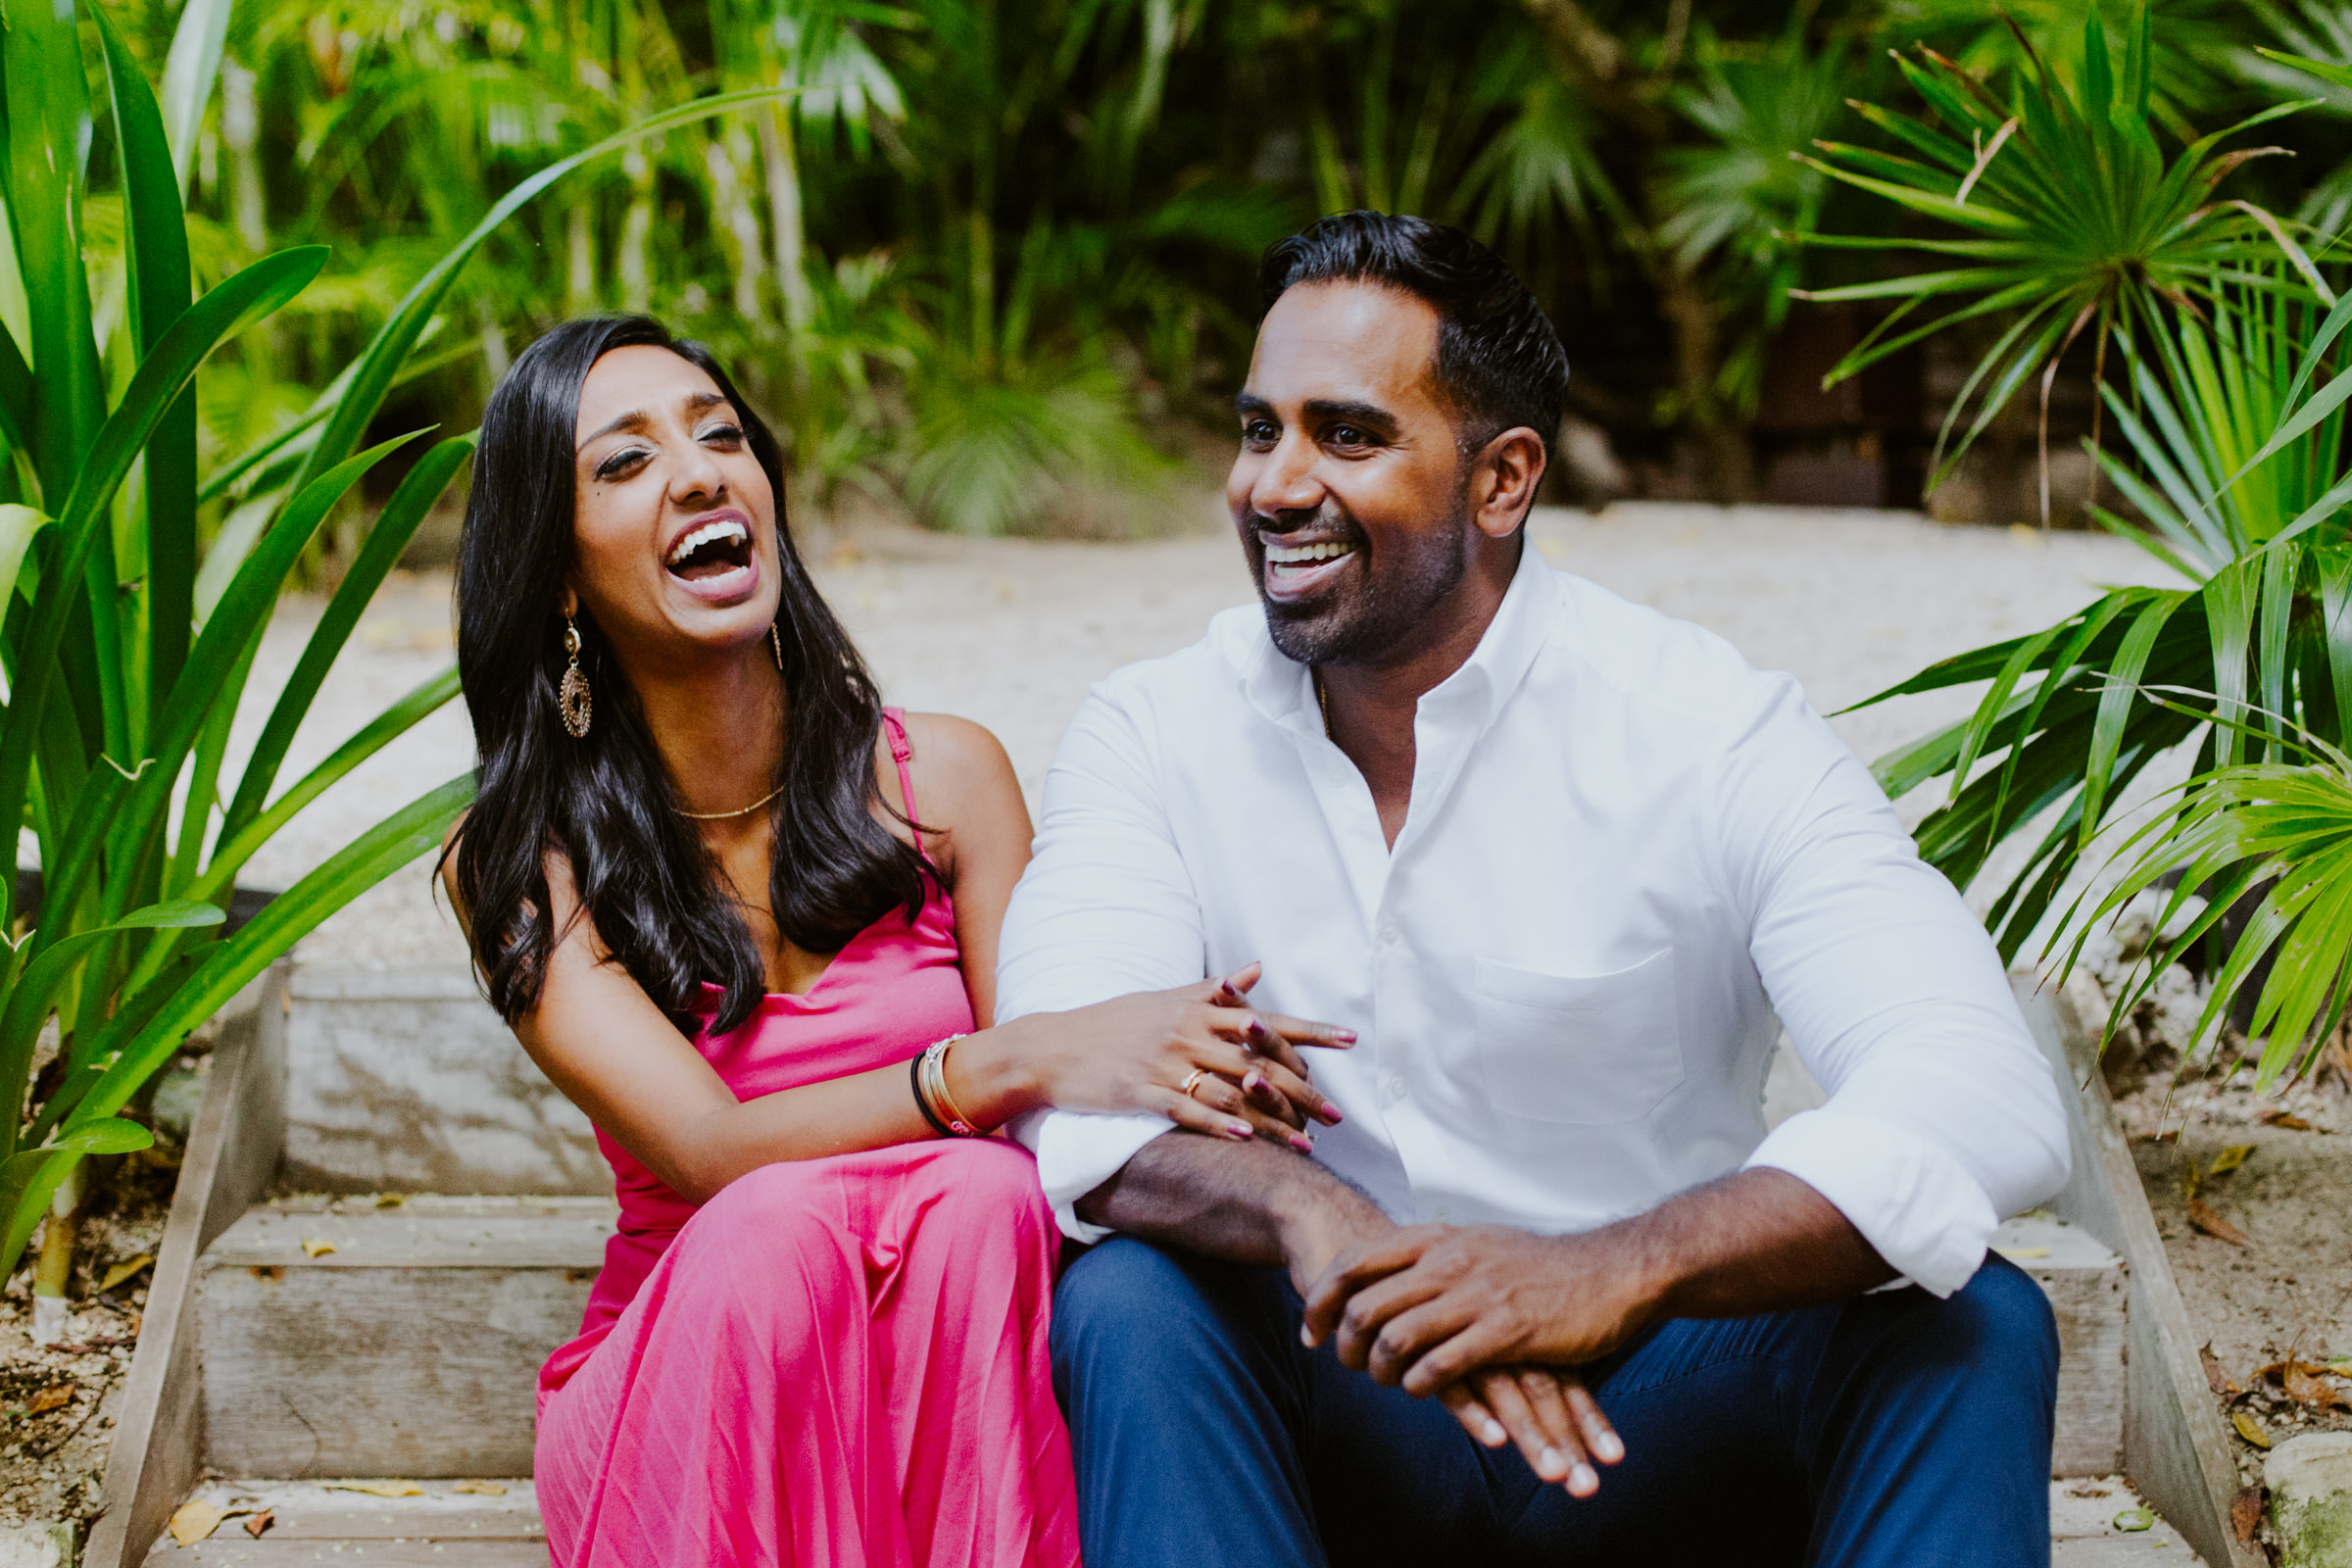 Engagement-Session-Nizuc-Resort-Spa-Indian-Wedding-Cancun-Mexico-Pierce--21.jpg